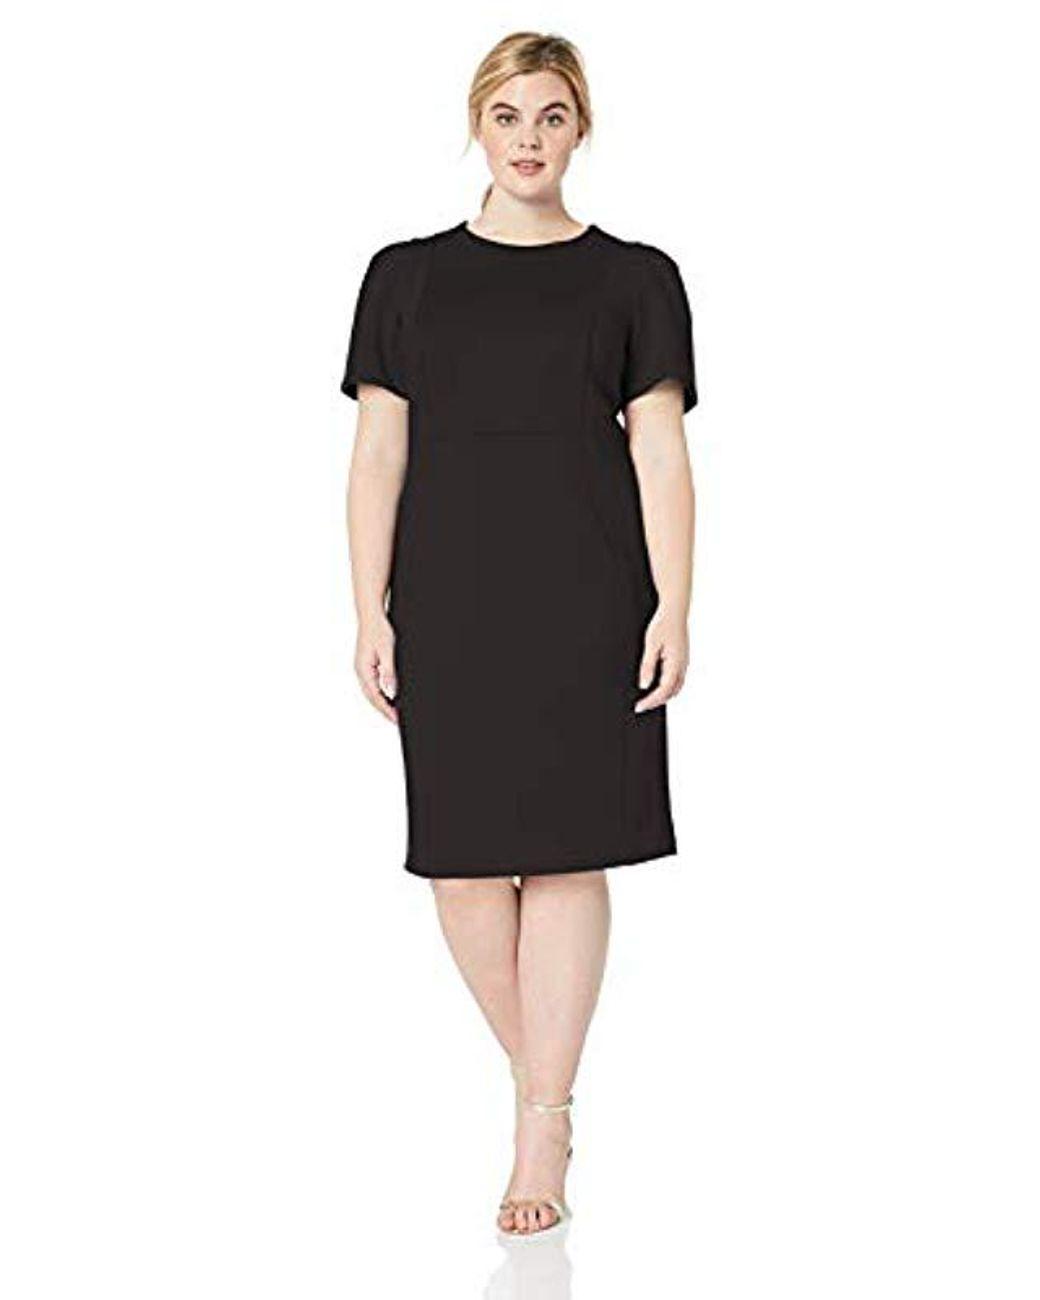 Women\'s Black Plus Size Short Sleeved Sheath With Princess Seams Dress